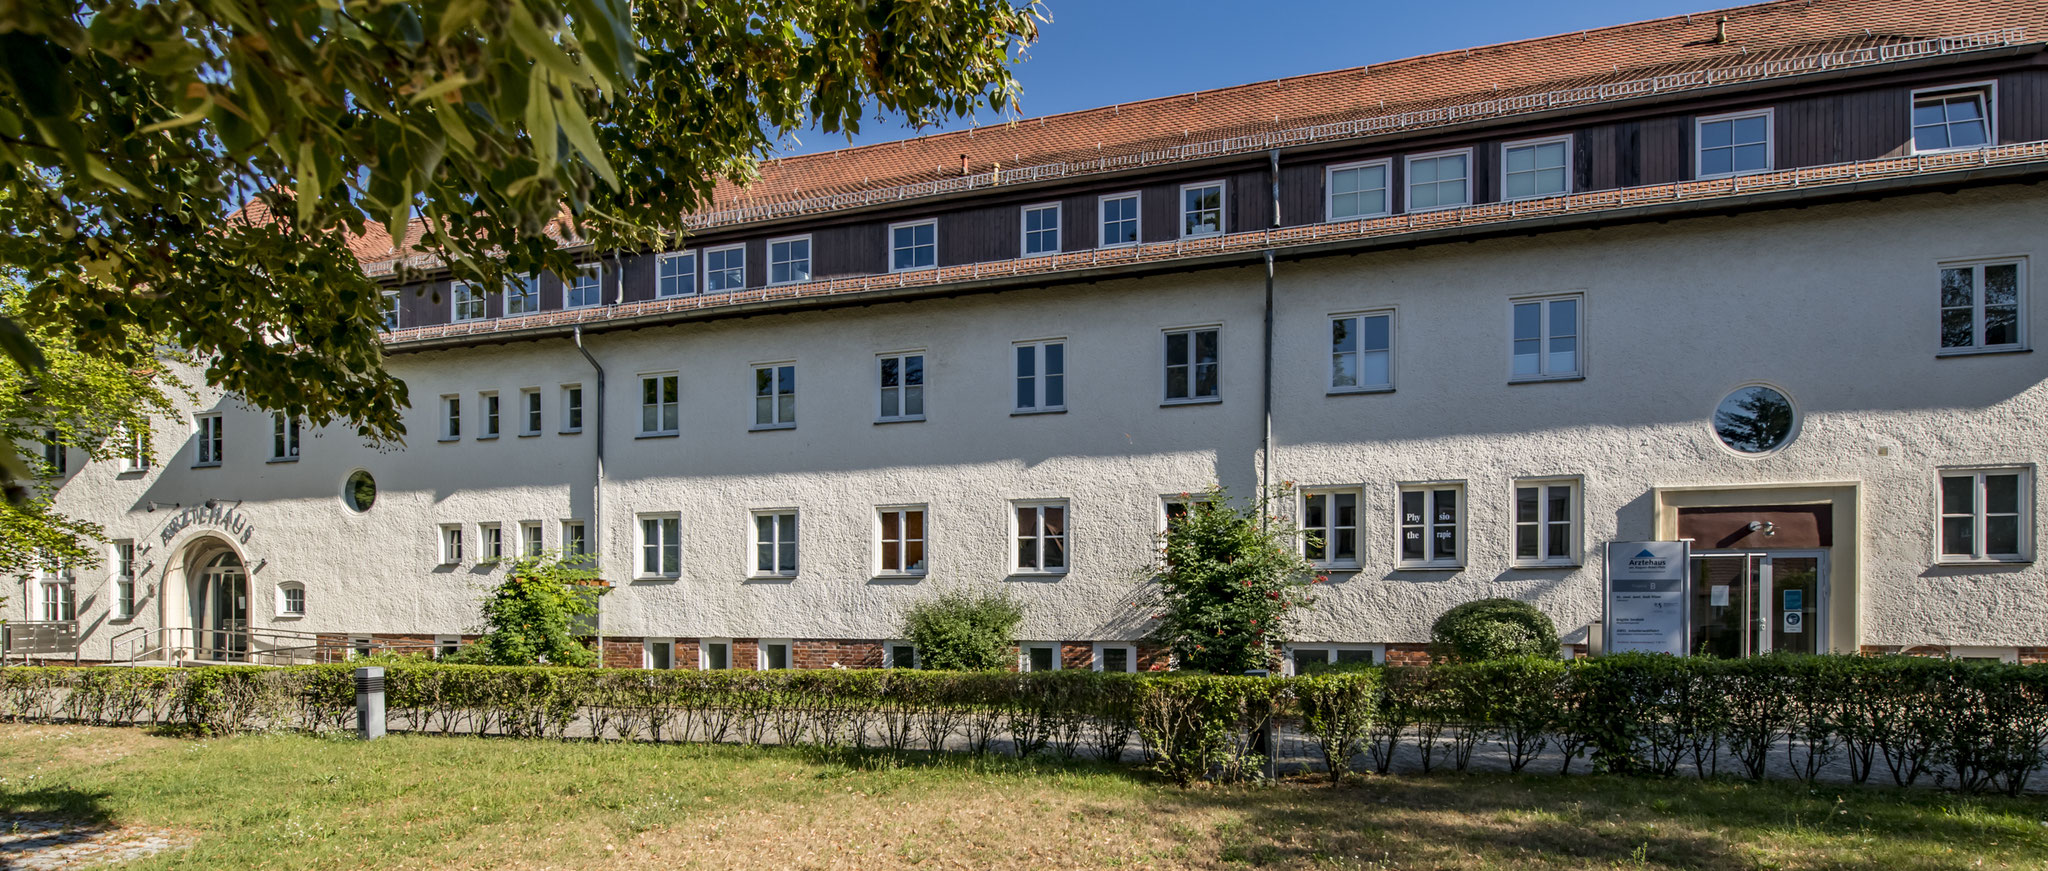 Ärztehaus am August-Bebel-Platz